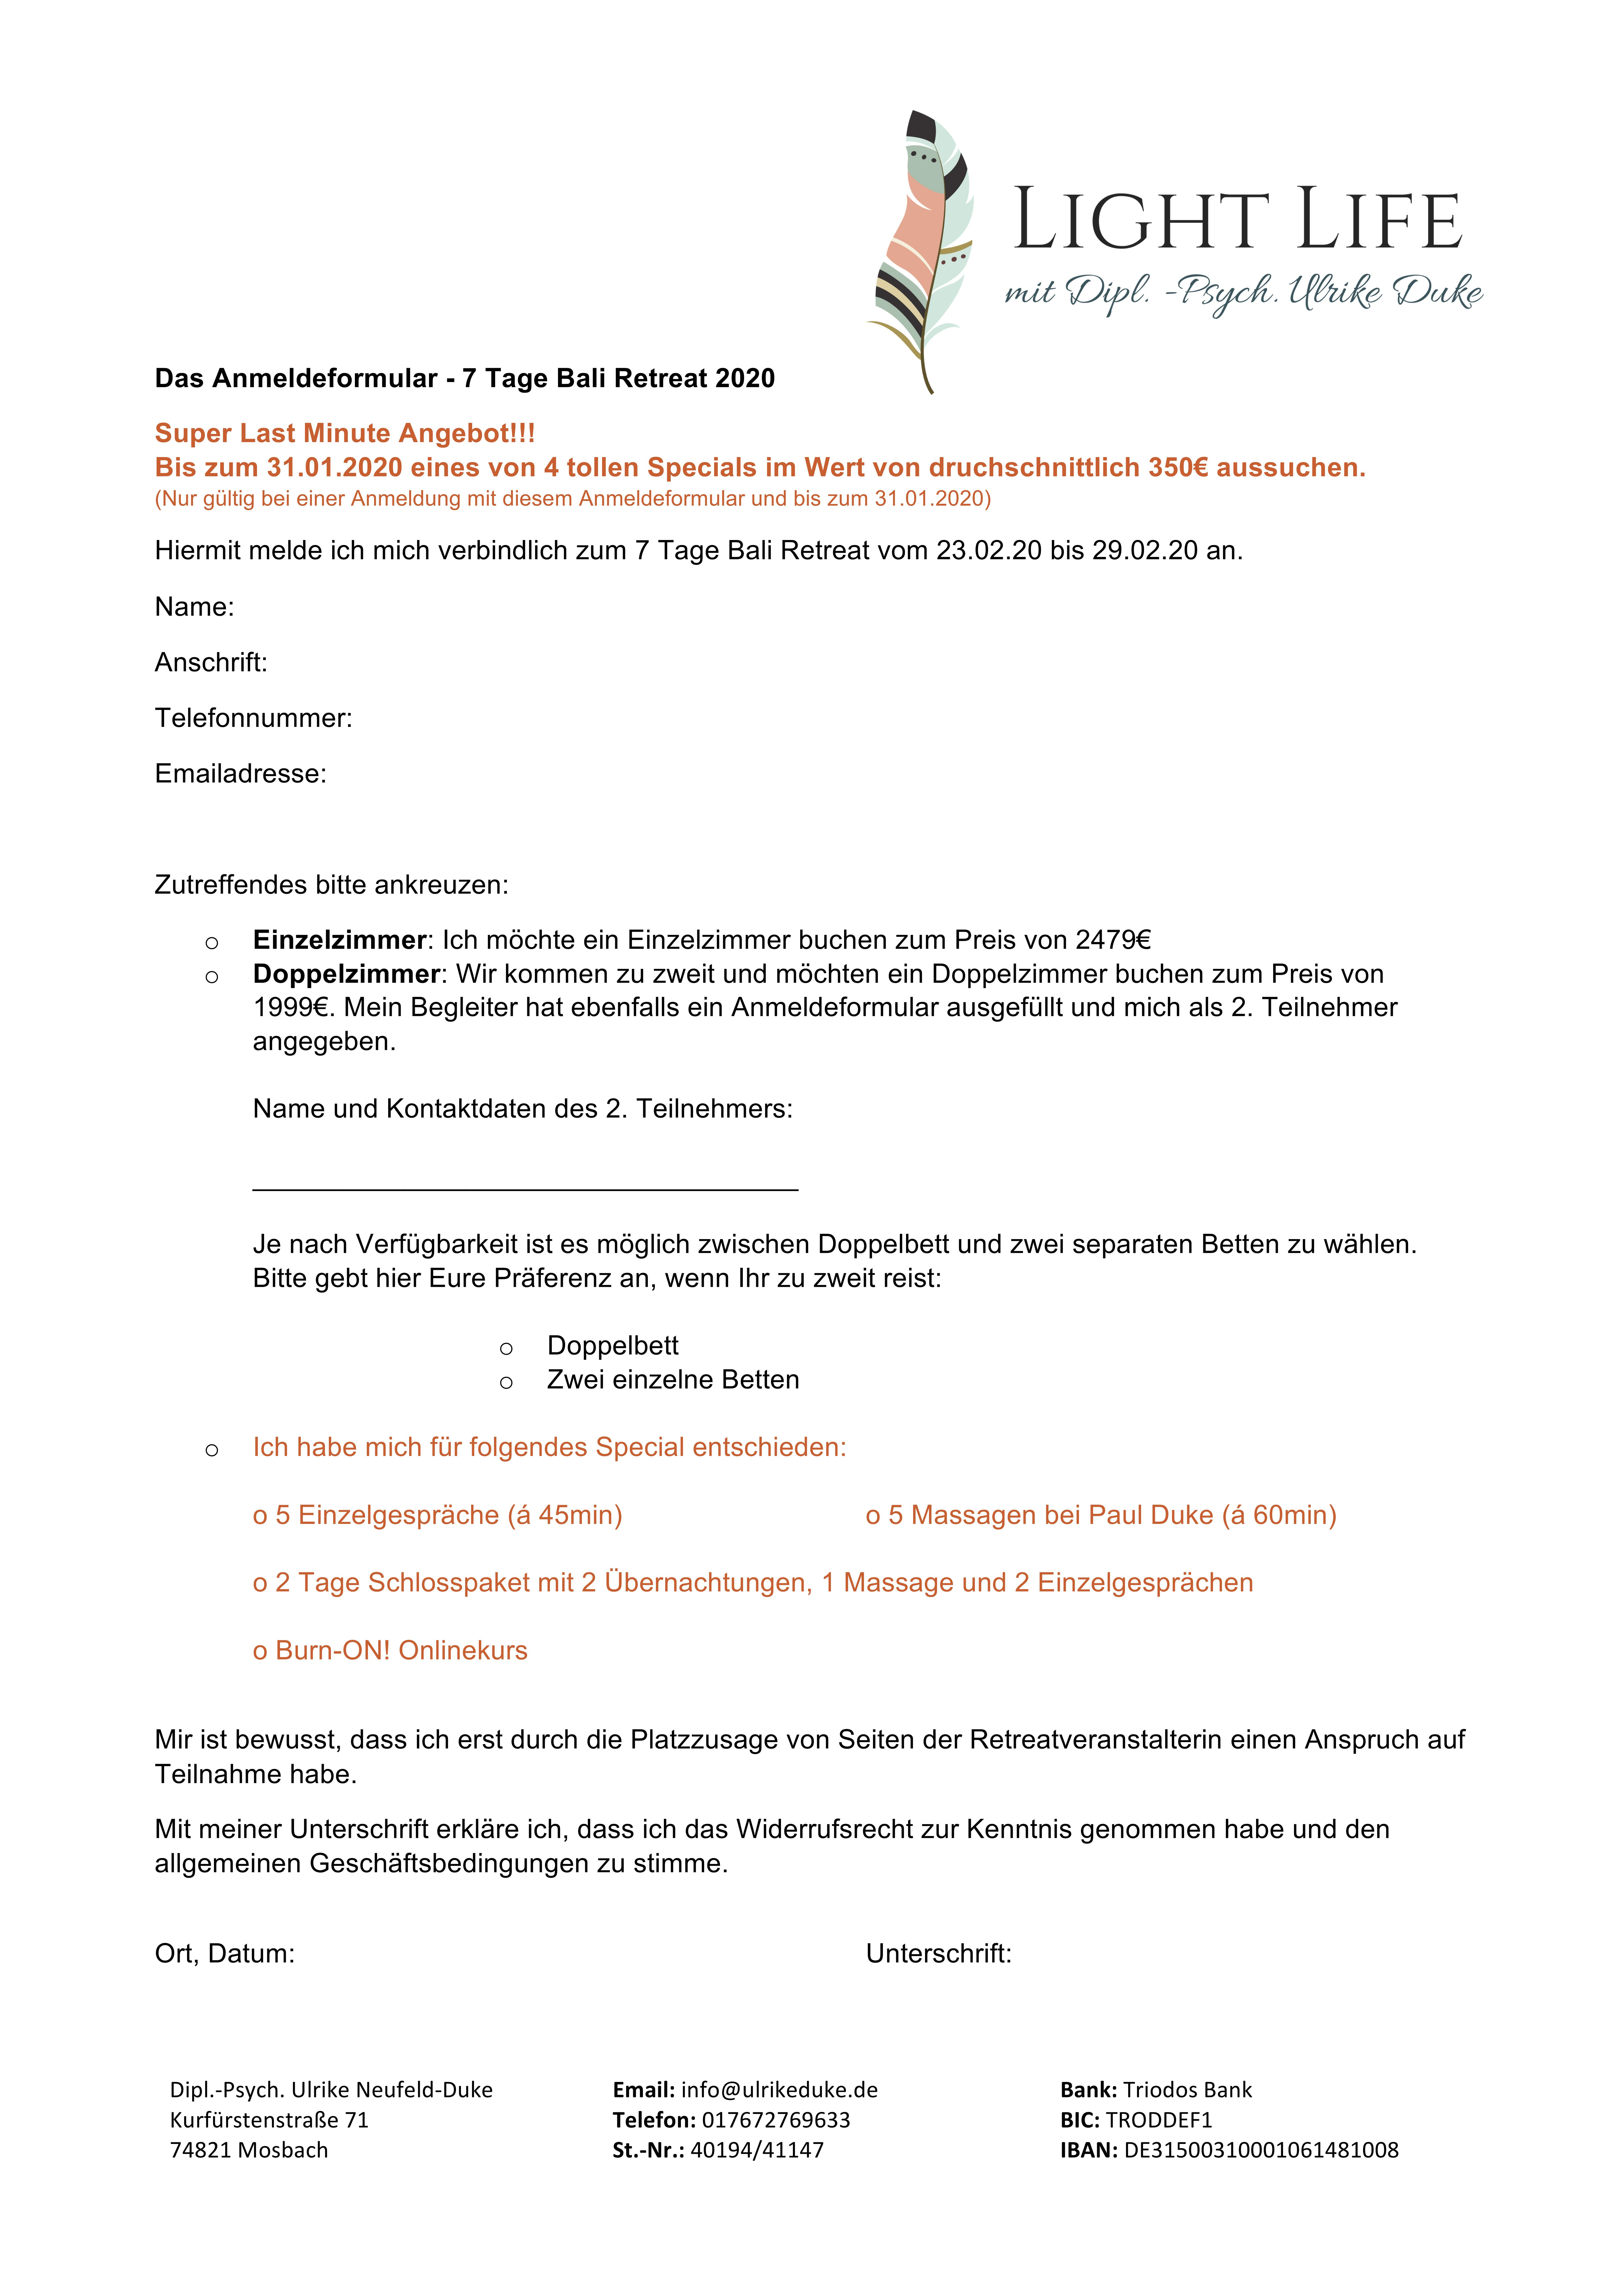 Anmeldeformular_Bali Retreat mit Ulrike Duke_Super Last Minute